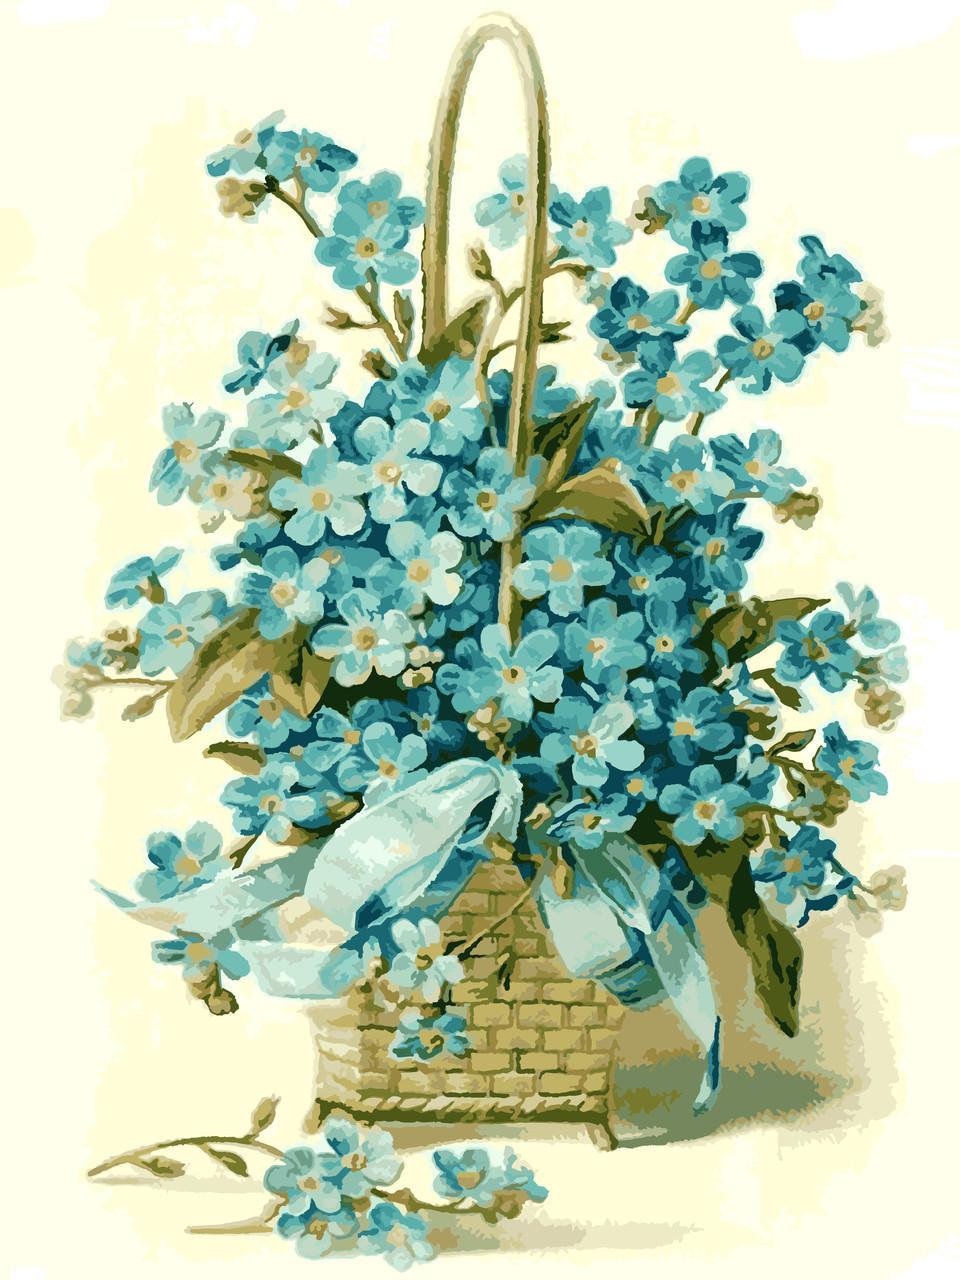 Картина по номерам Корзинка цветов, 30x40 см., Идейка